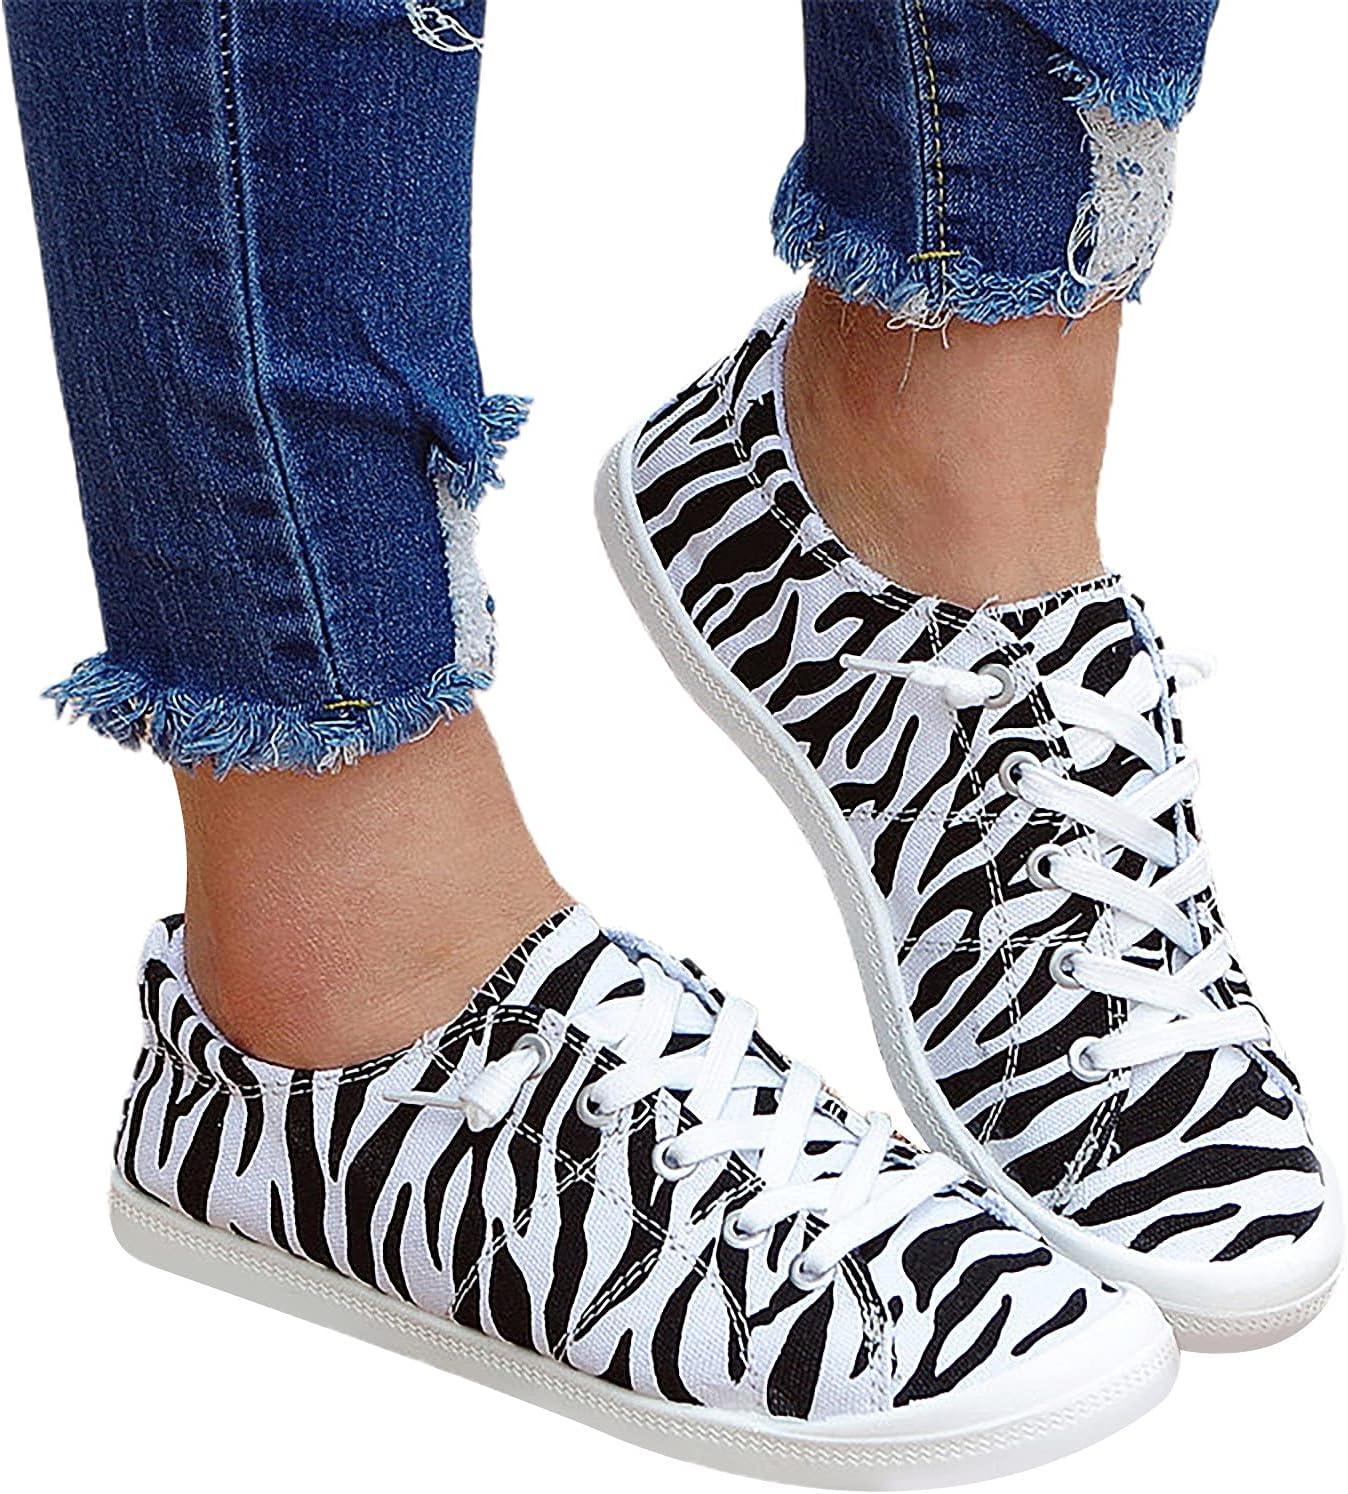 Limited time cheap sale Bomden Low-Cut Canvas Shoes Large-scale sale Version Korean One-Foot Lazy